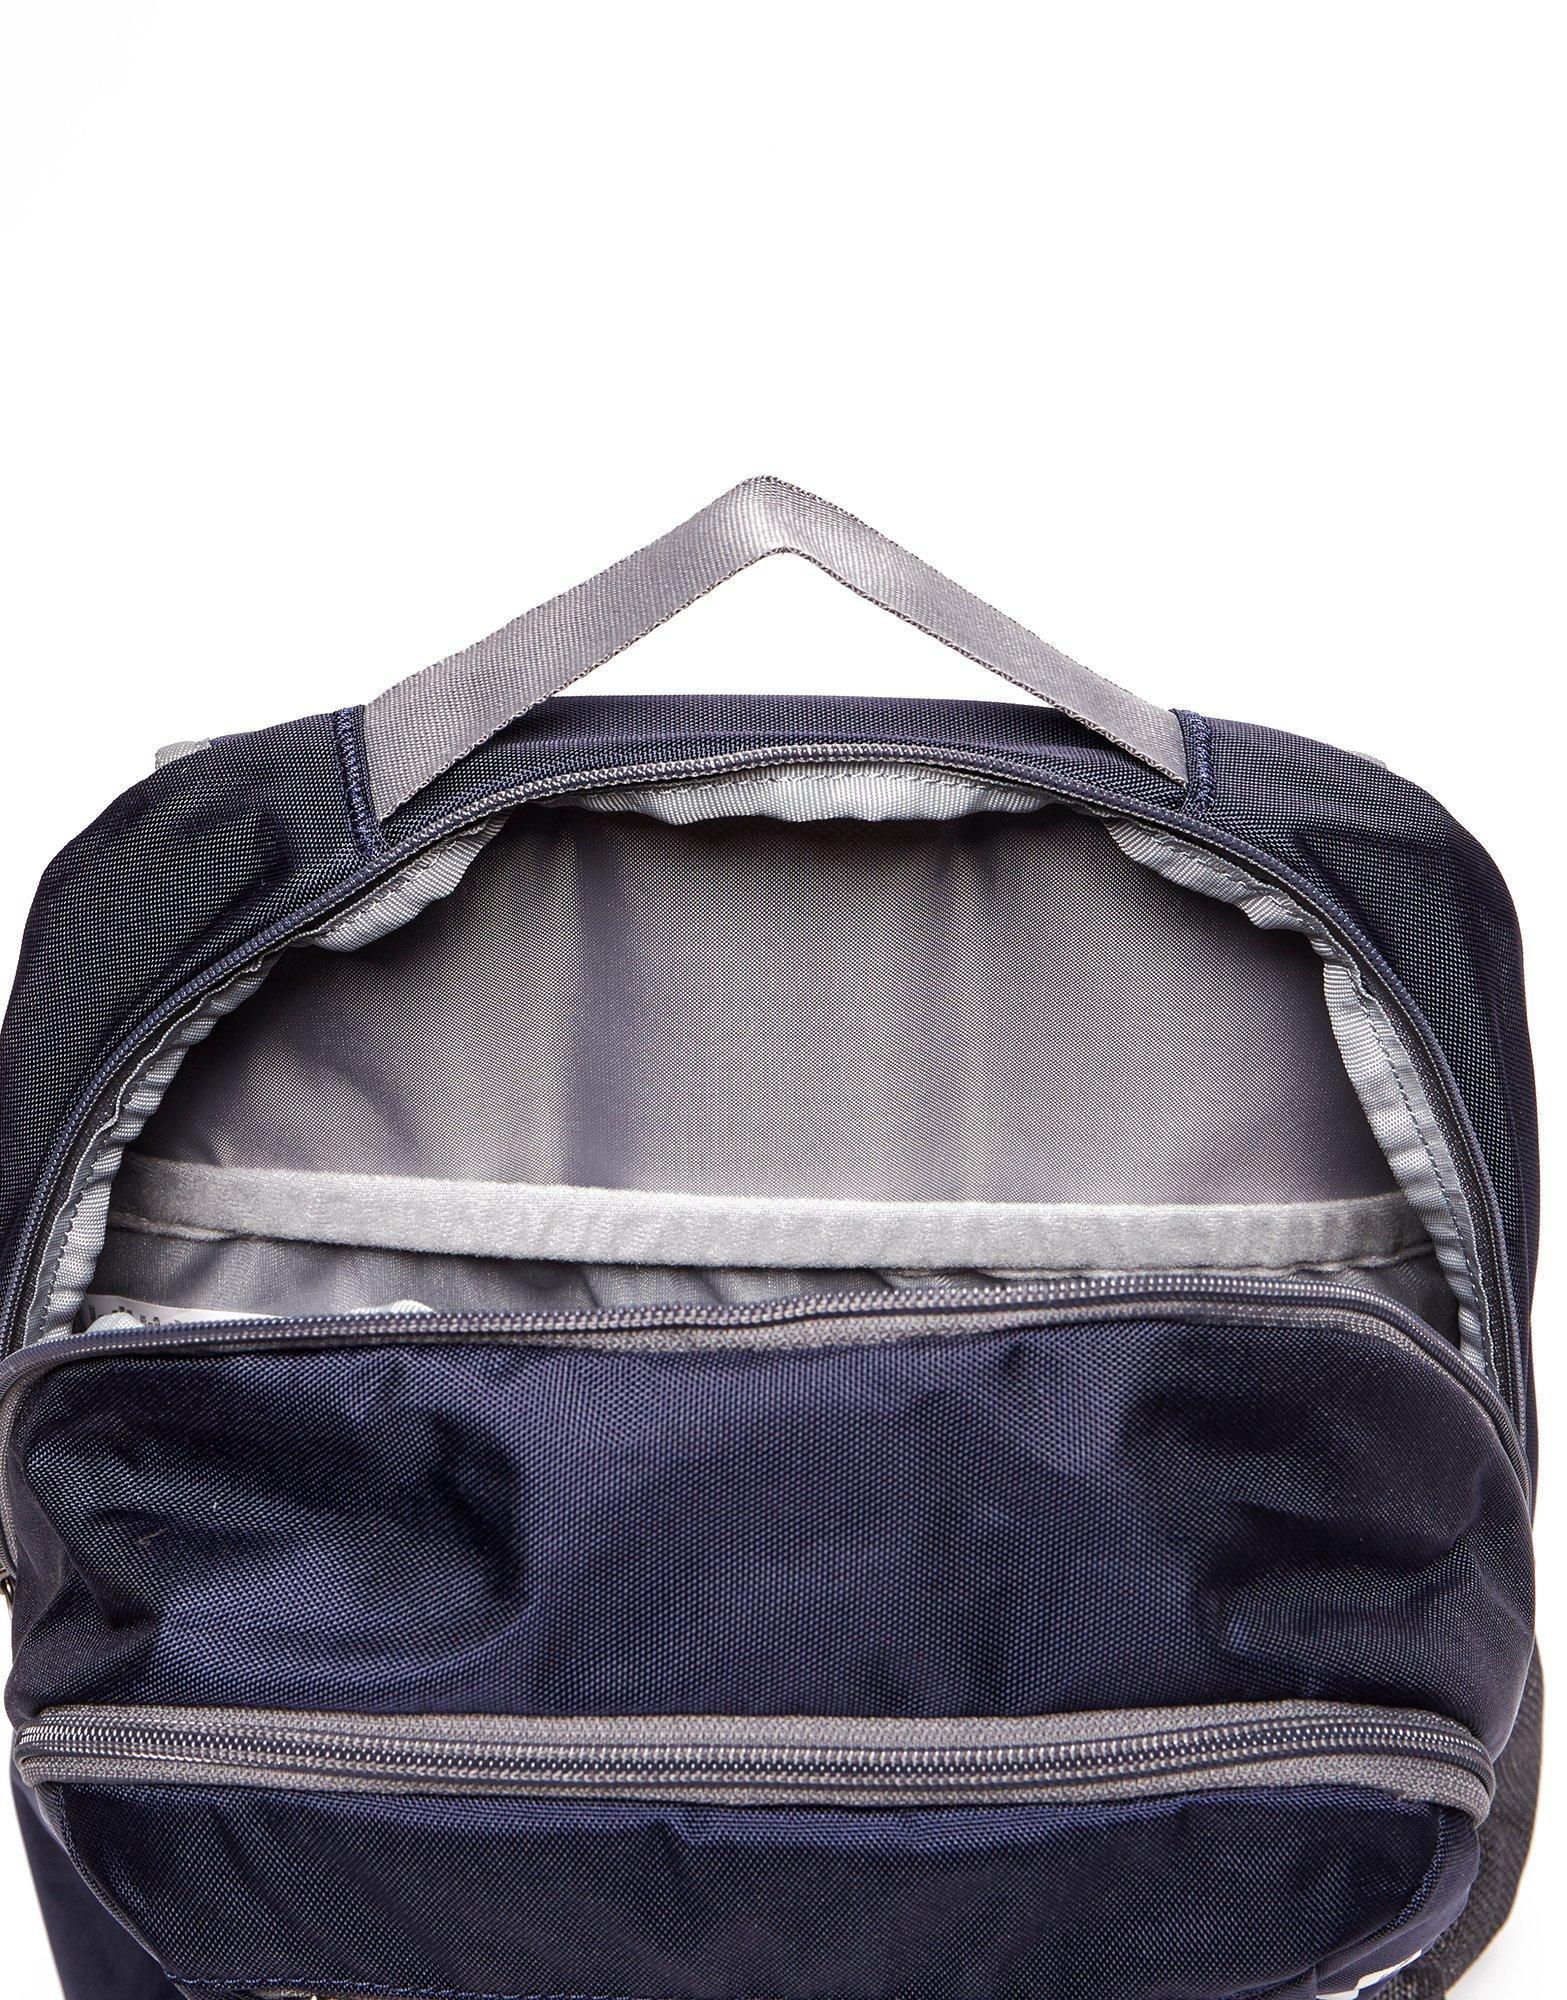 d9e52d80e7 Lyst - Under Armour Storm Hustle Backpack in Blue for Men